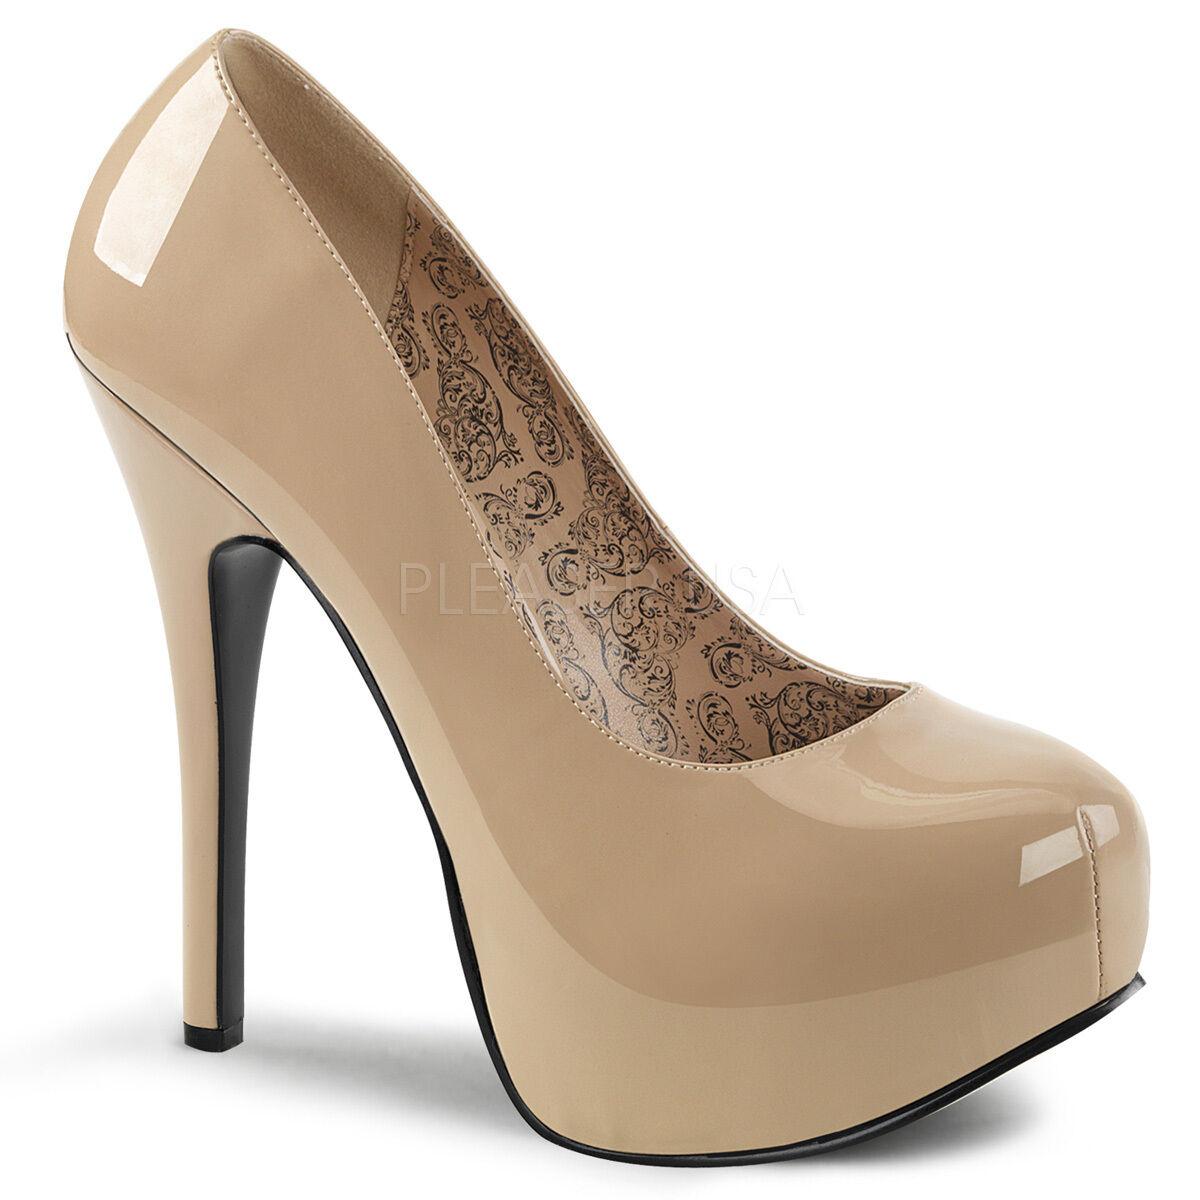 PLEASER Sexy WIDE WIDTH shoes Hidden Platform Stiletto Heel Cream Patent Pumps